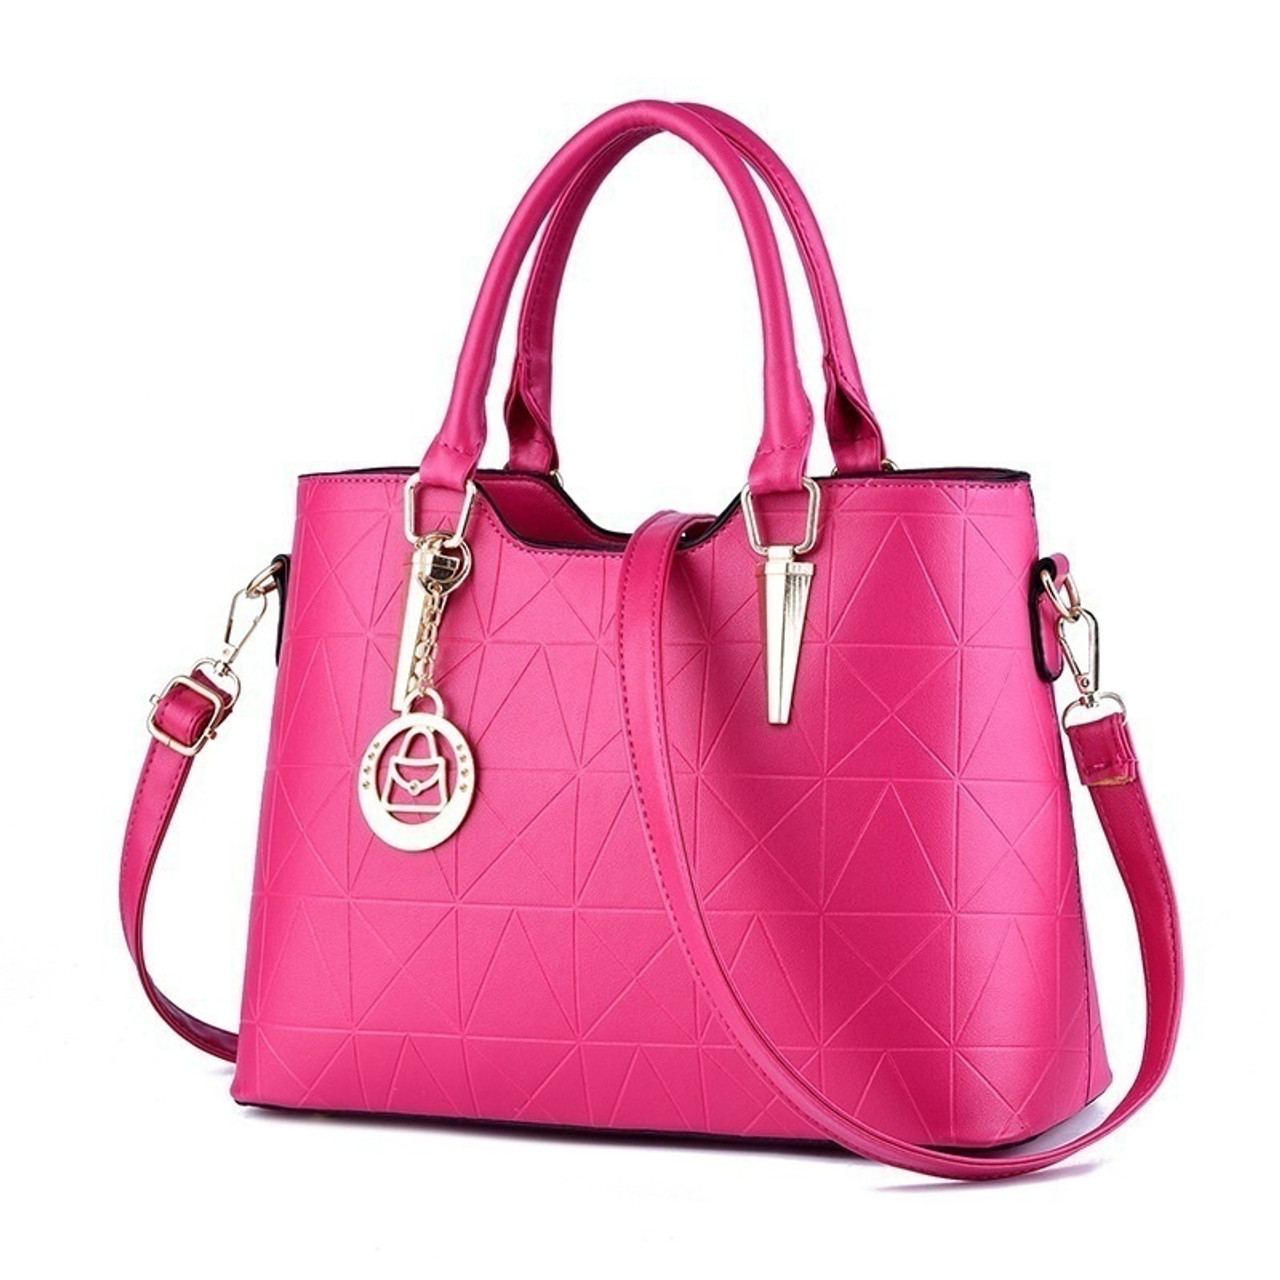 1afa3f3be931f ... New Arrival Womens Bag Tote Bag Handbag Female Korean Sweet Lady  Fashion Handbag Crossbody Shoulder Handbag ...